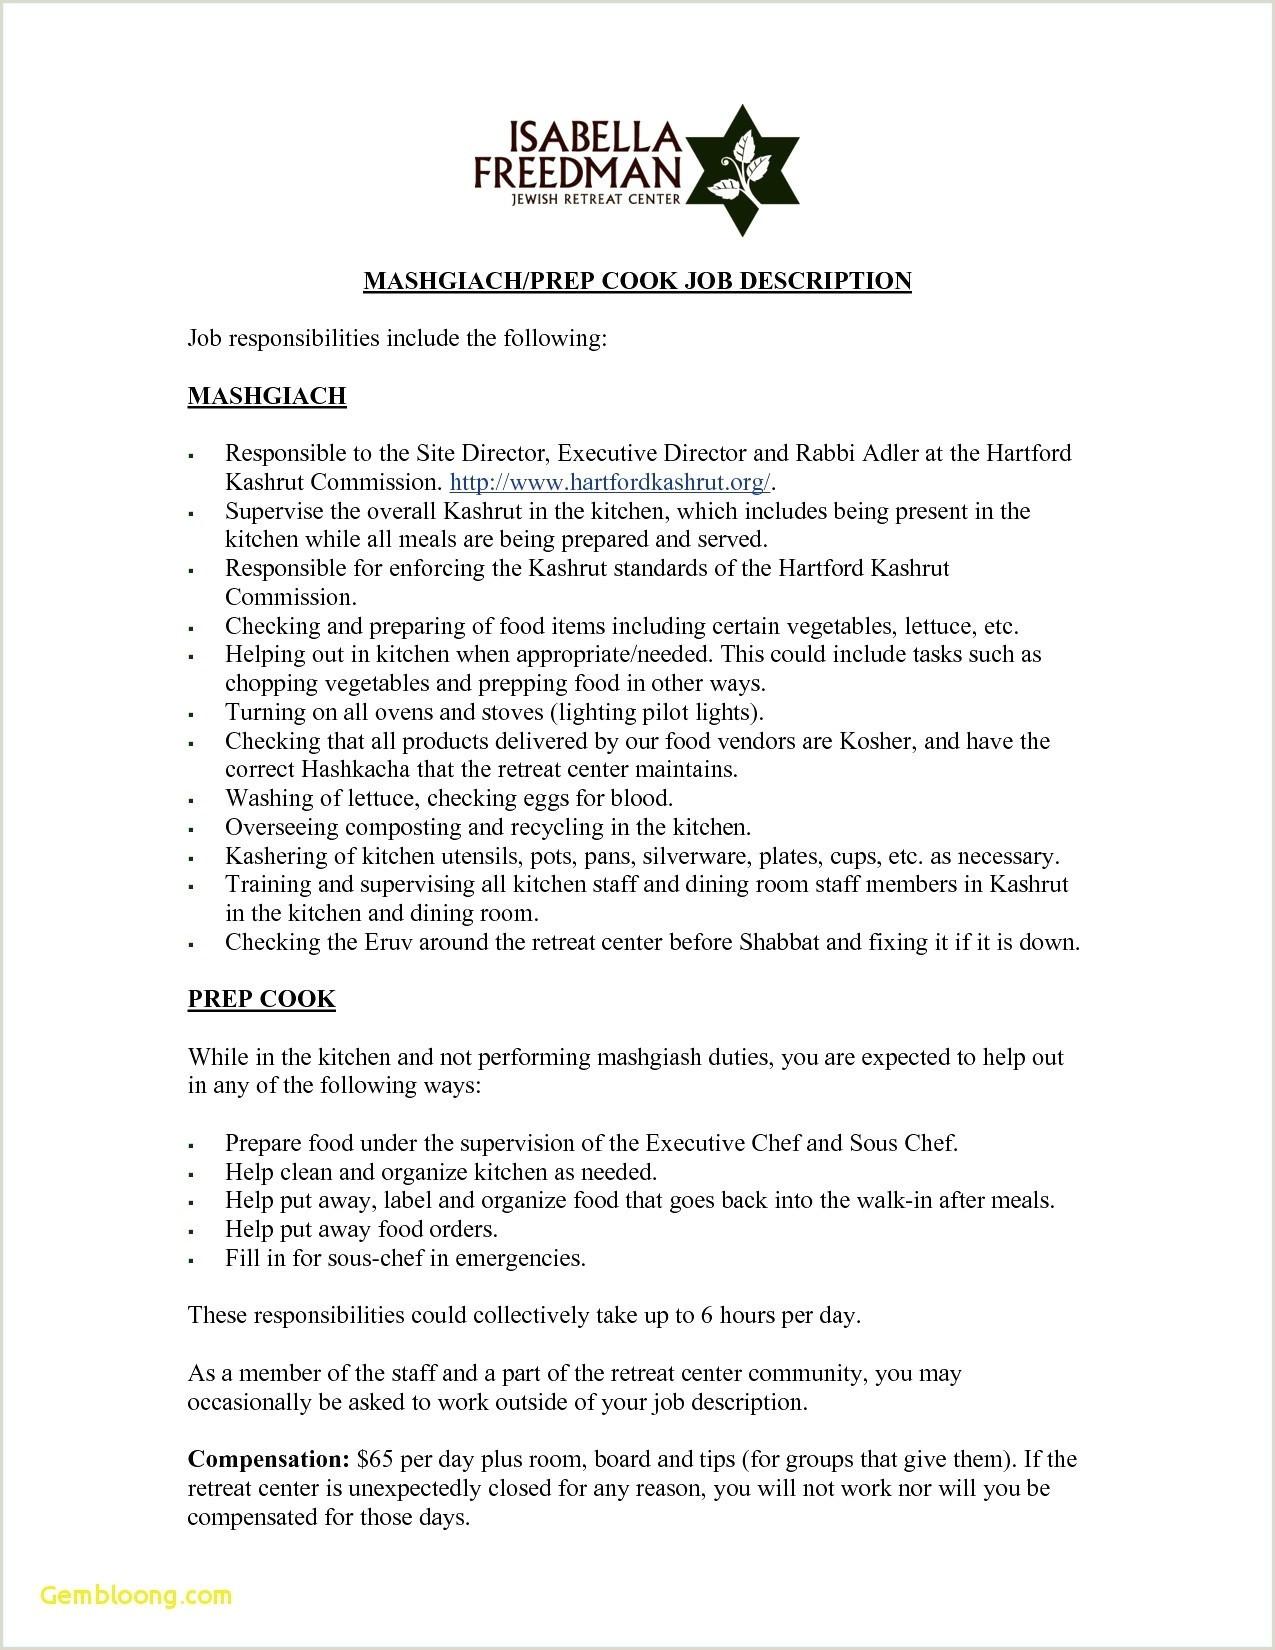 Should I Put Fast Food On My Resume 25 Free Server Job Descriptions for Resumes